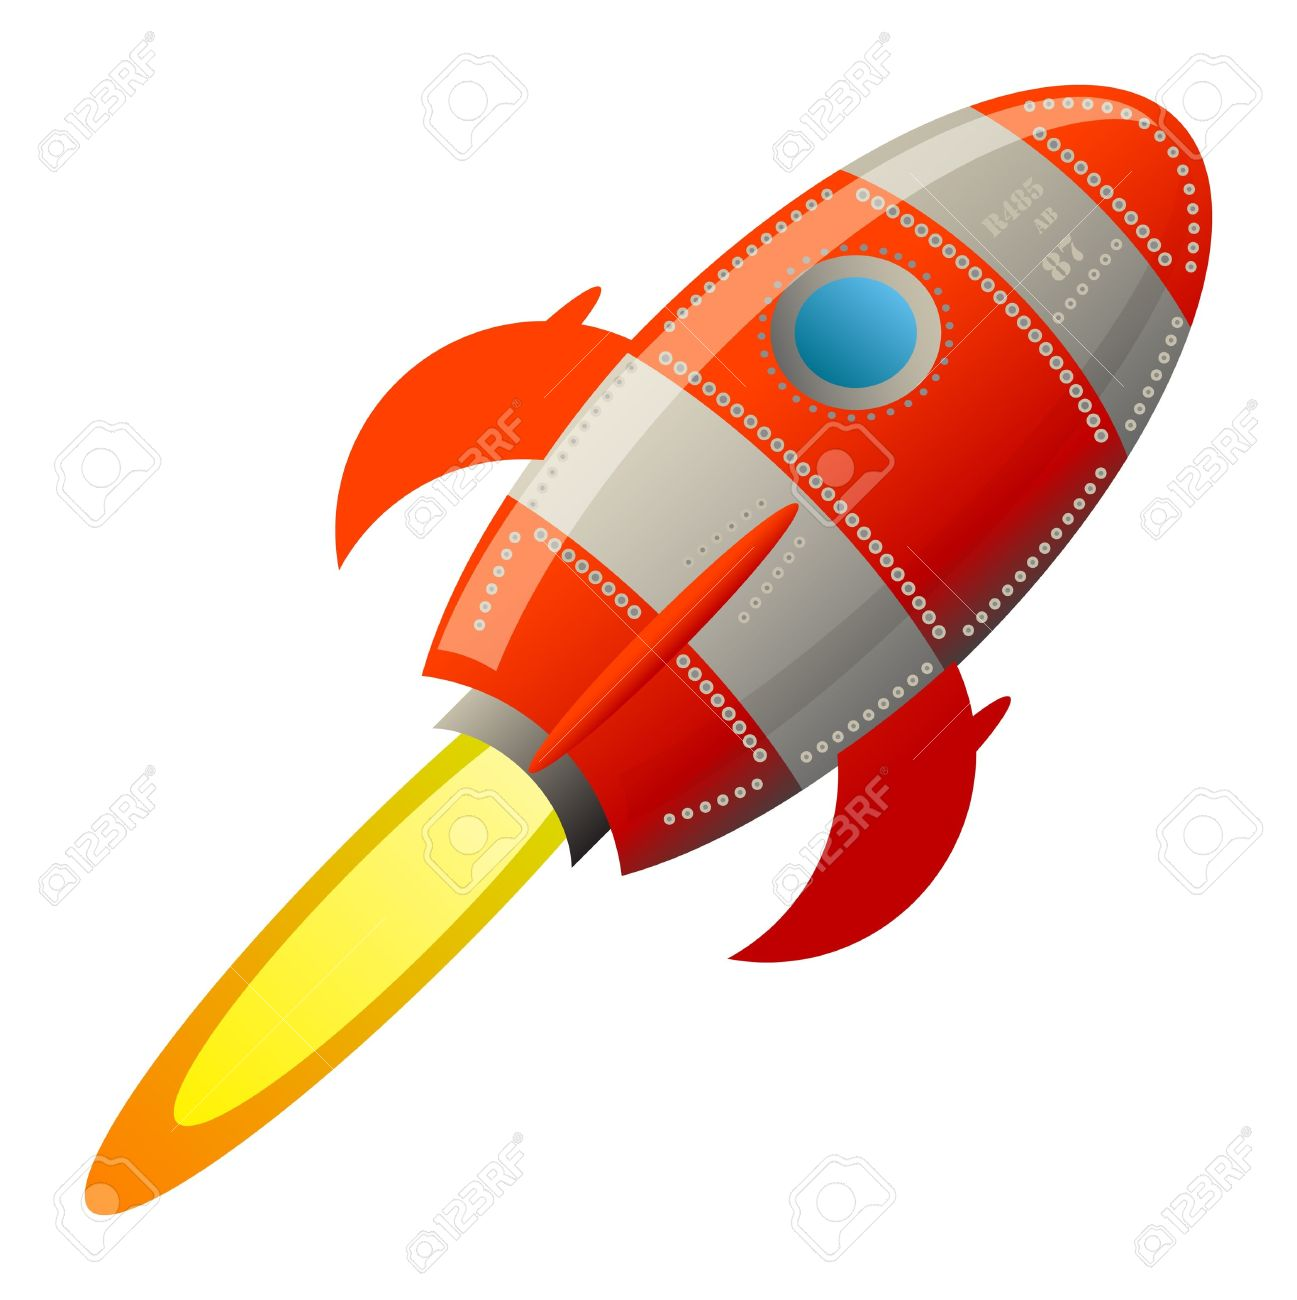 Retro Rocket Royalty Free Cliparts, Vectors, And Stock.